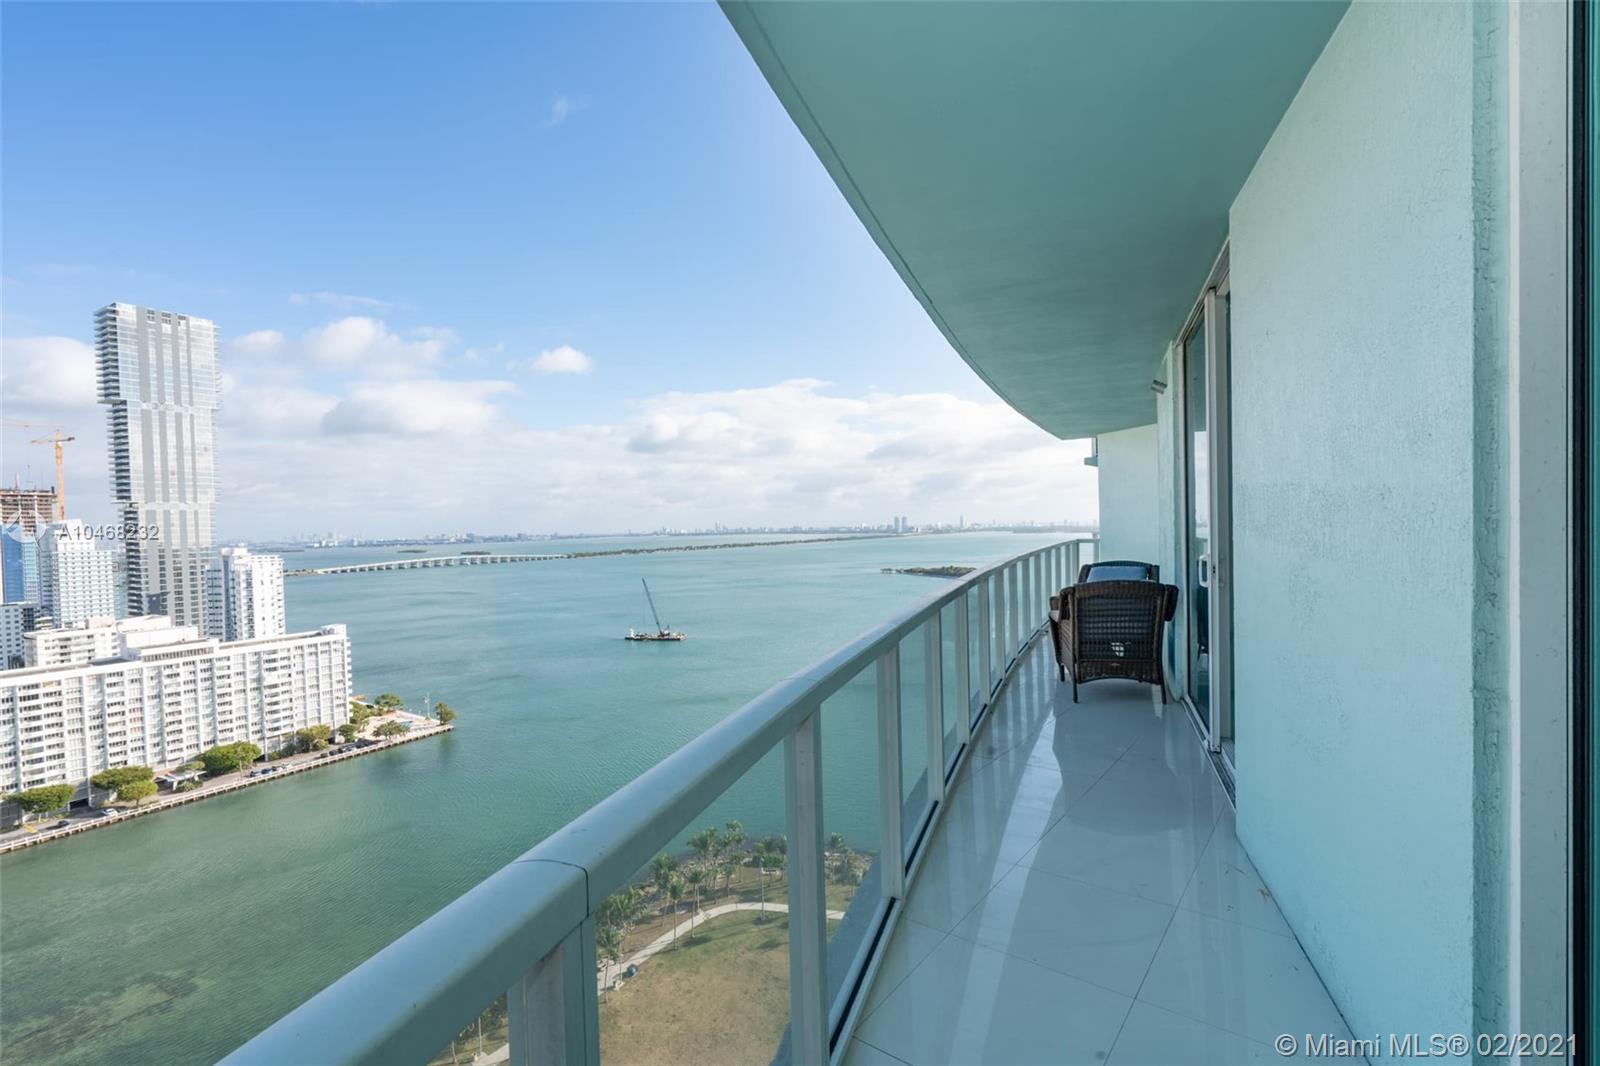 1900 N Bayshore Dr #2604, Miami FL 33132